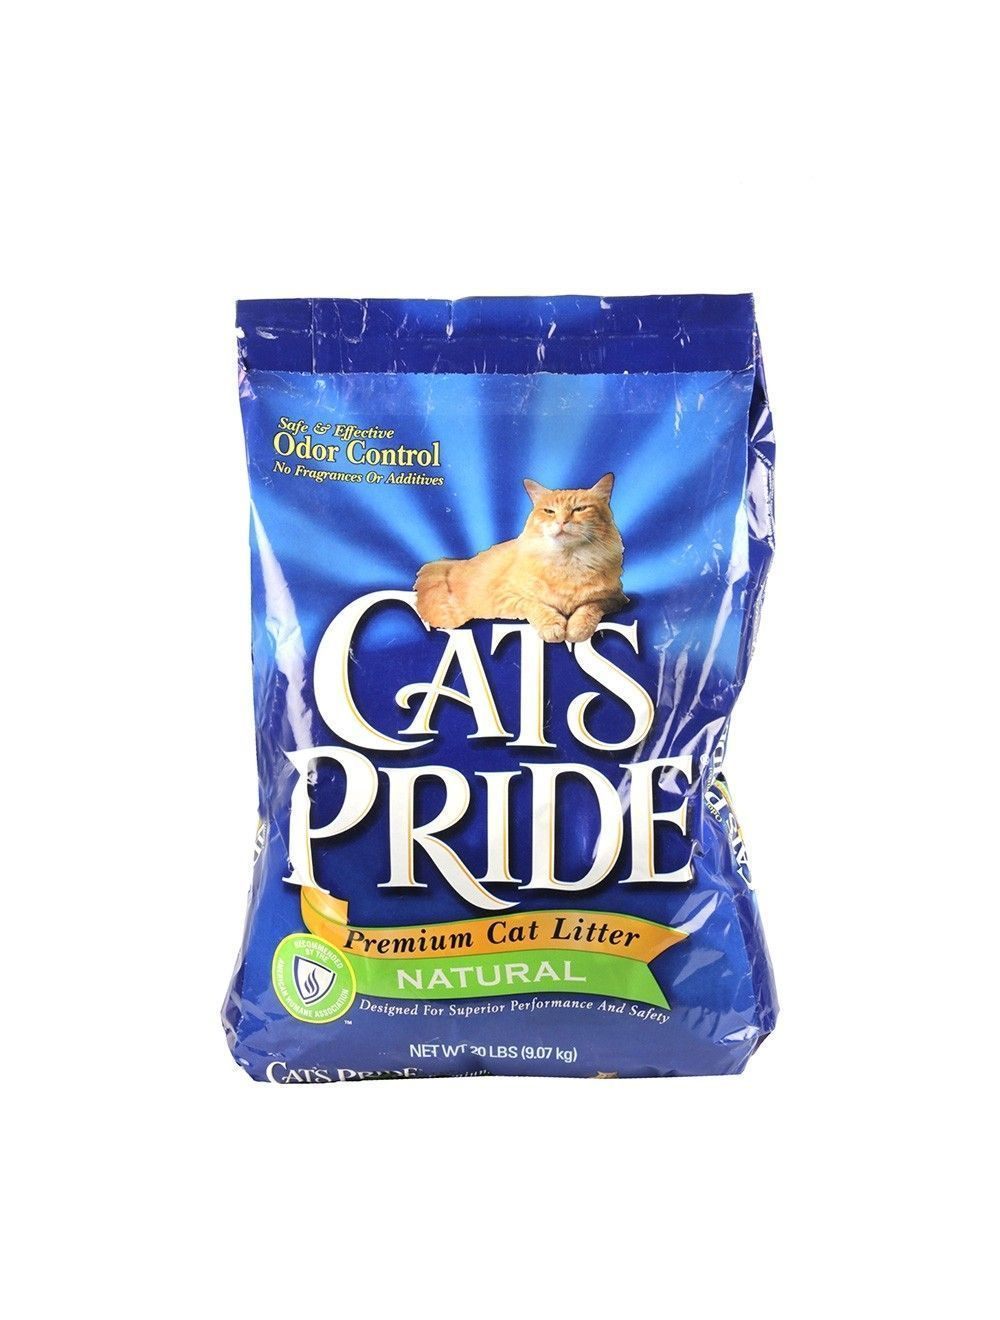 Cats Pride Premium Cat Litter Natural